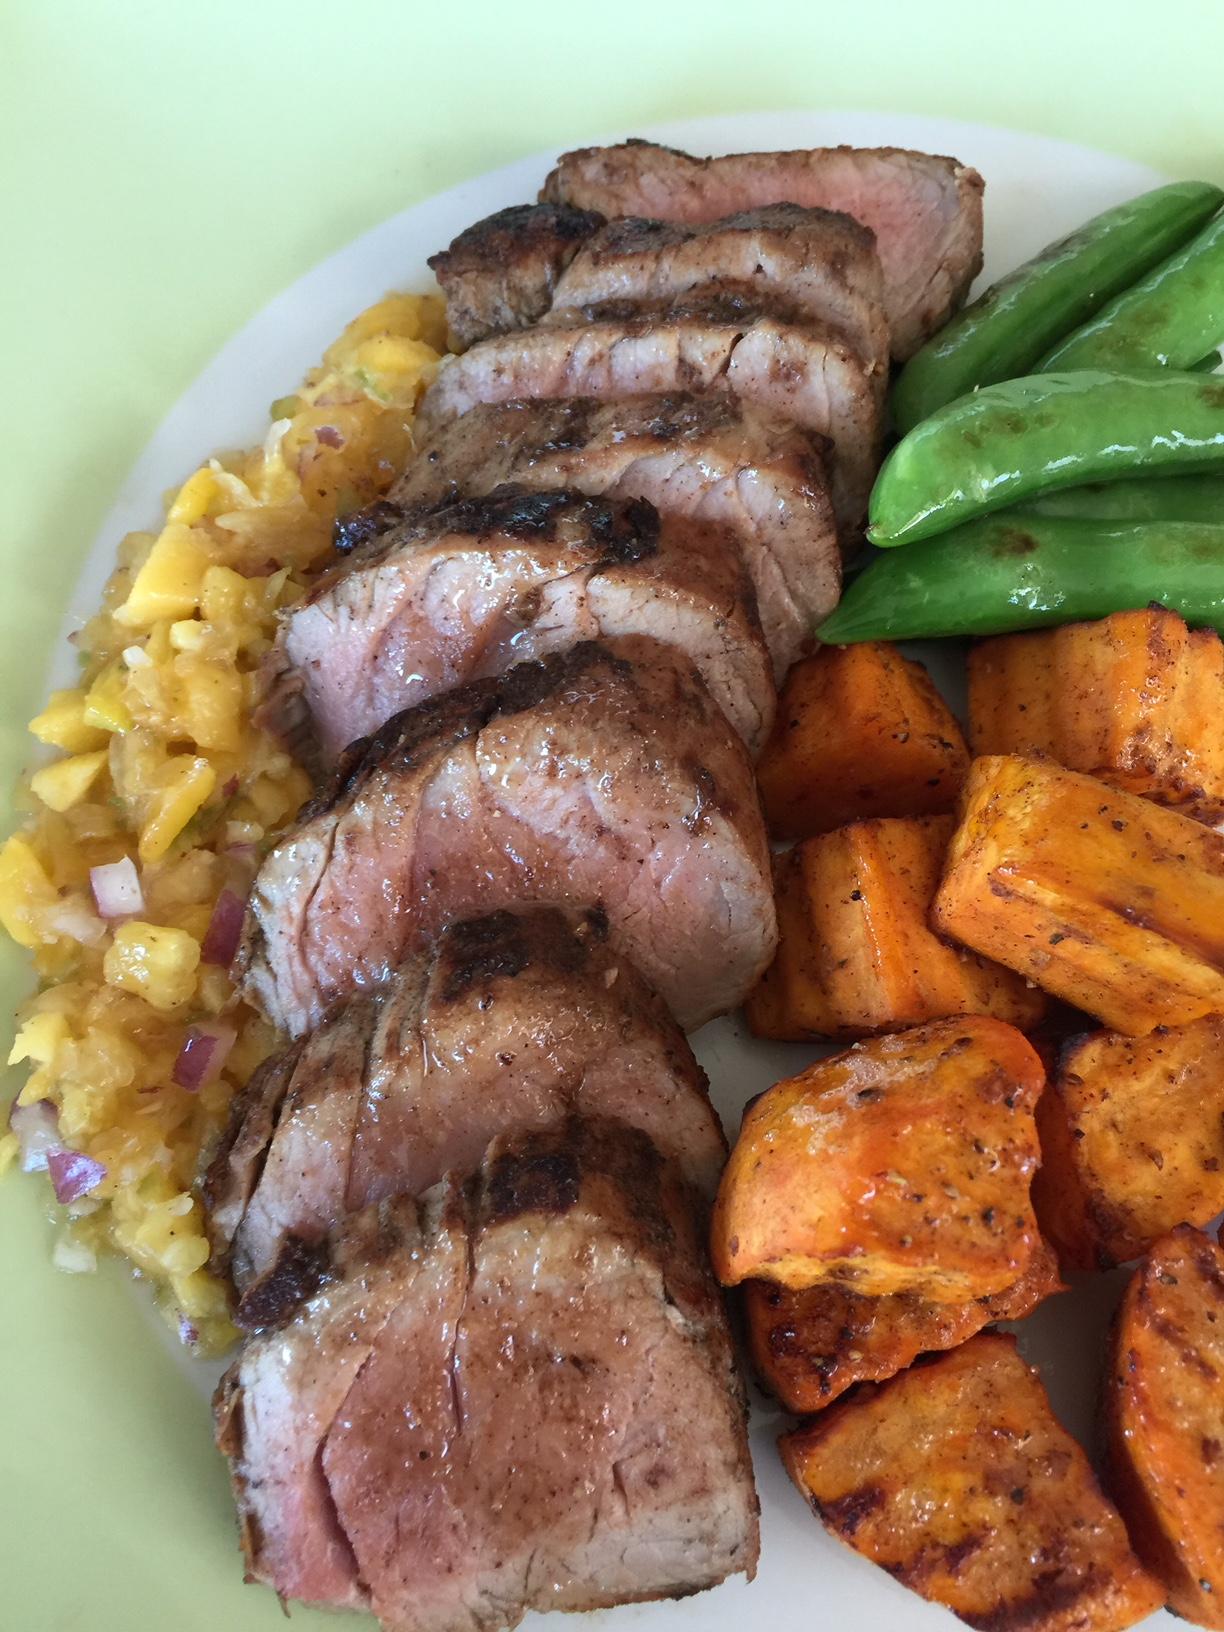 Jamaican jerk pork tenderloin with pineapple mango salsa, Caribbean Spiced Sweet Potatoes and Sugar Snap Peas